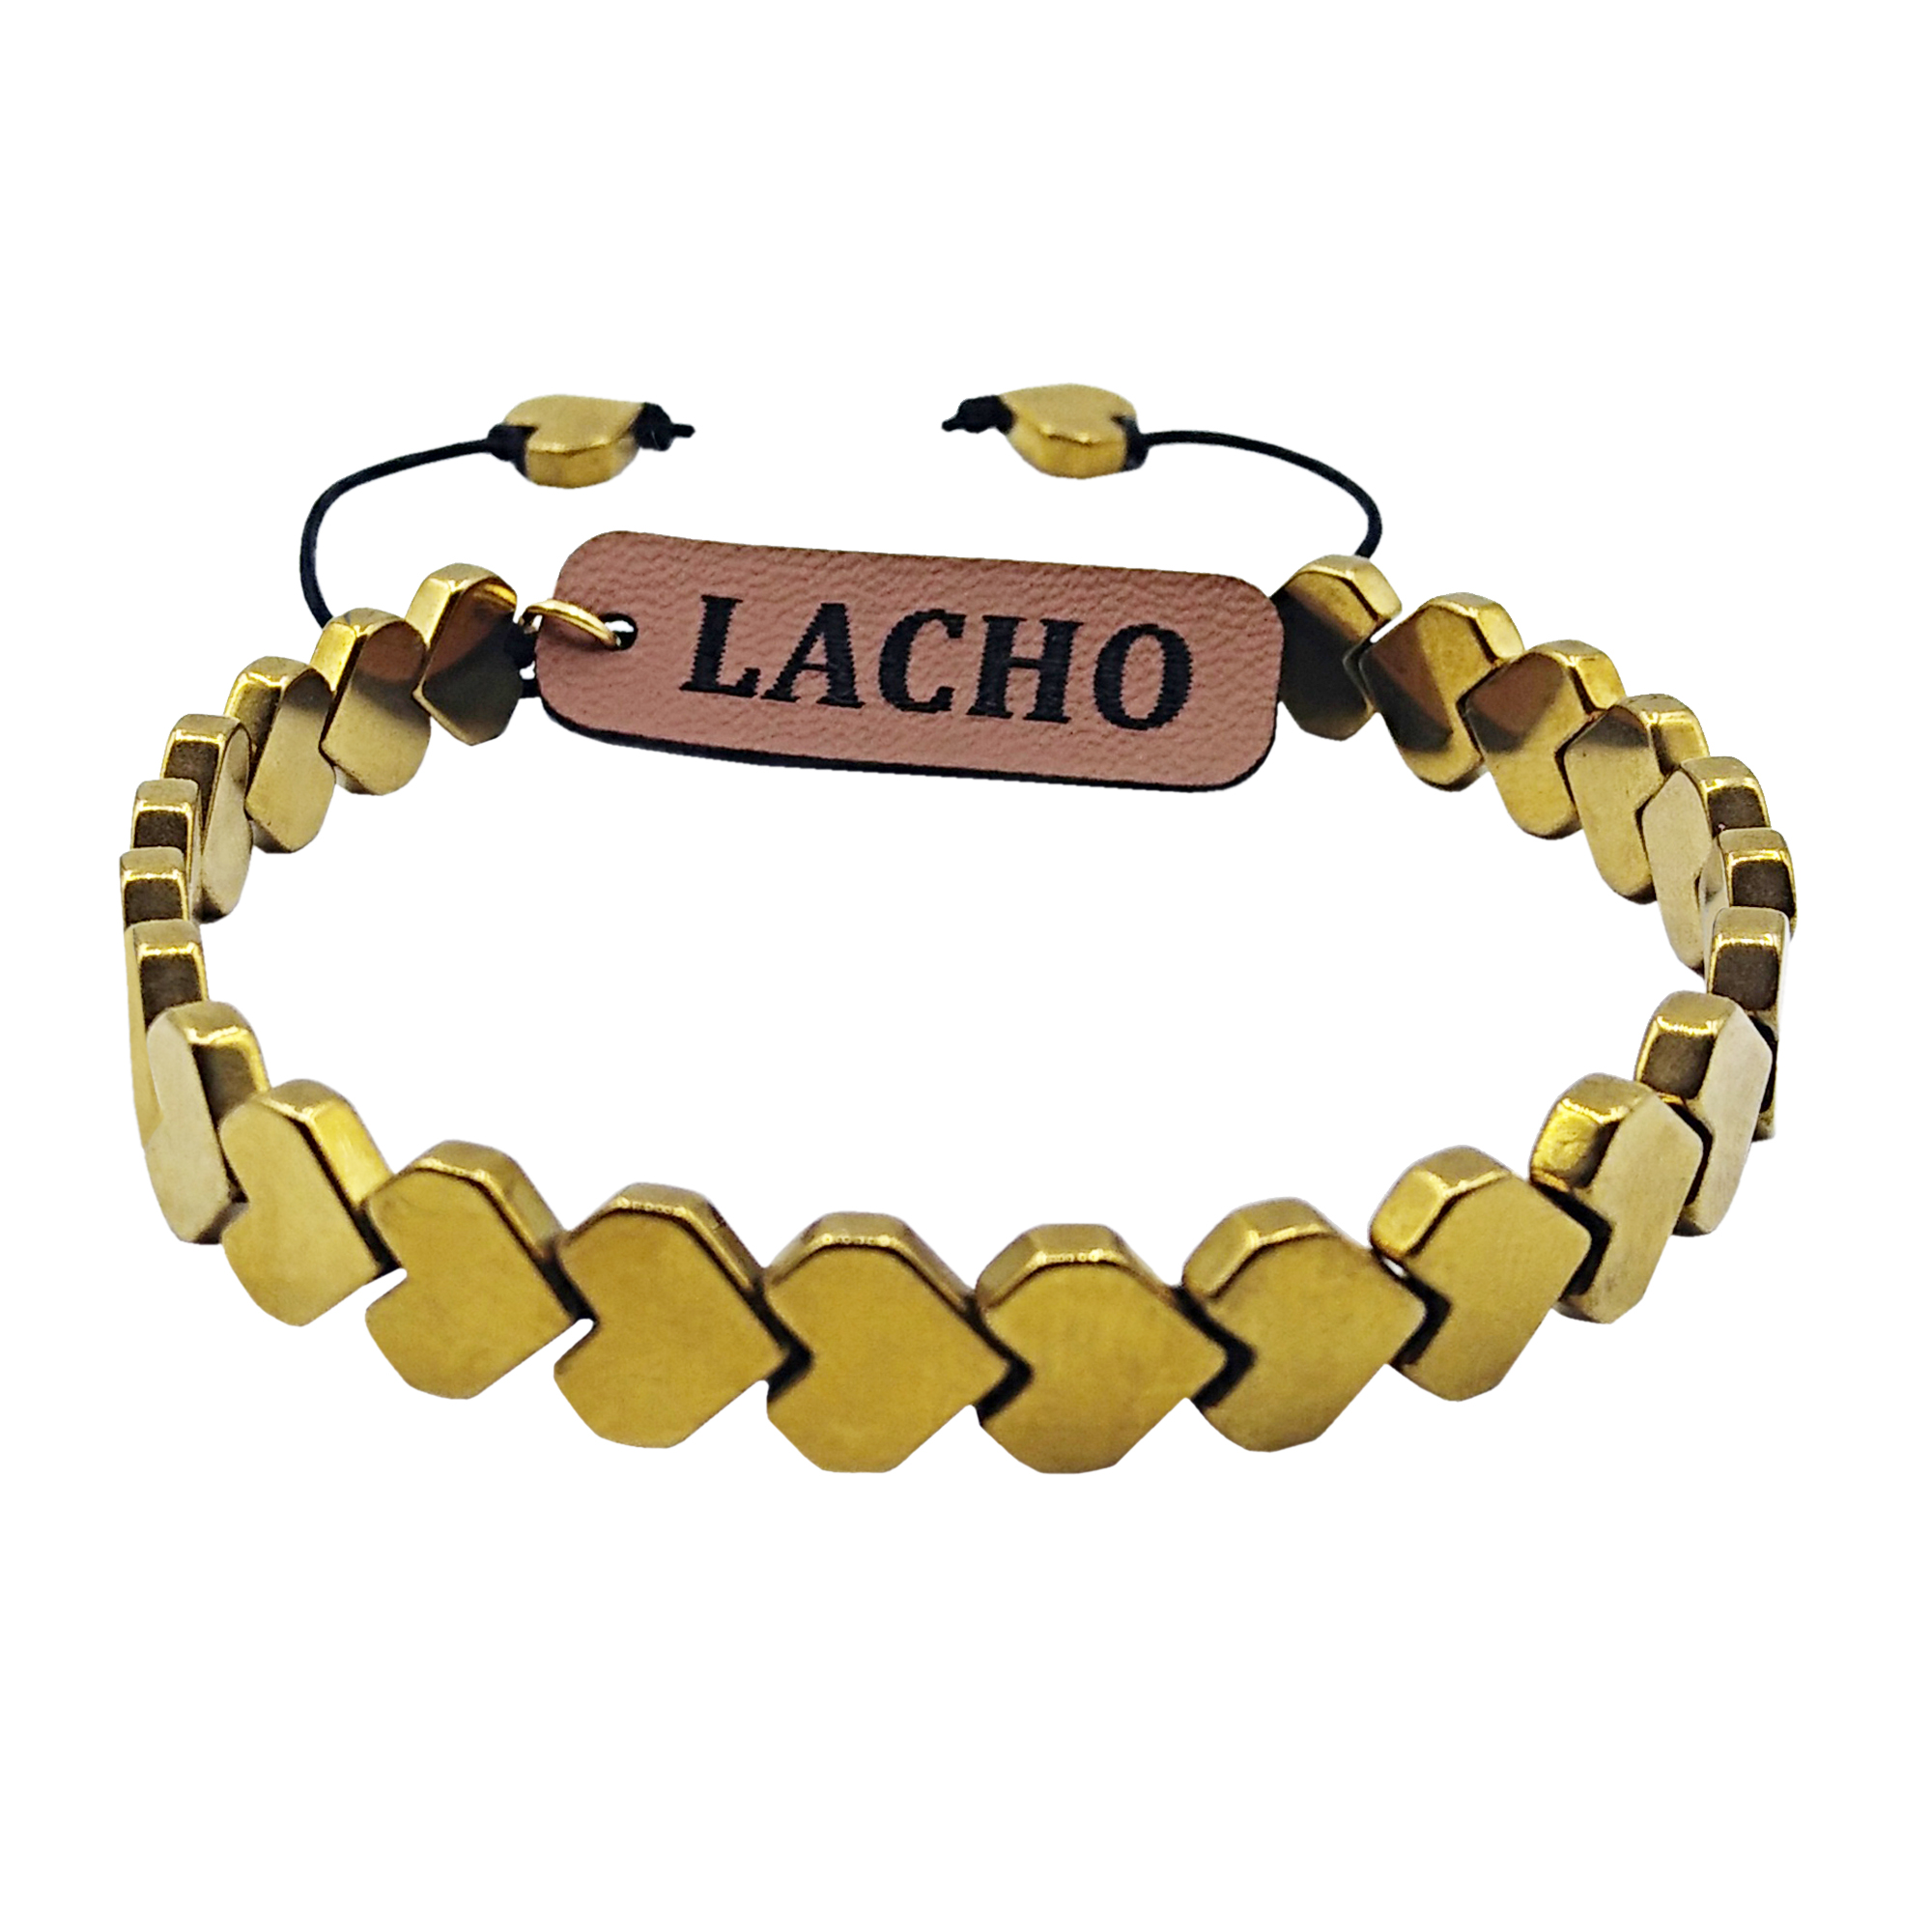 دستبند زنانه لاچو طرح قلب کد GH-002